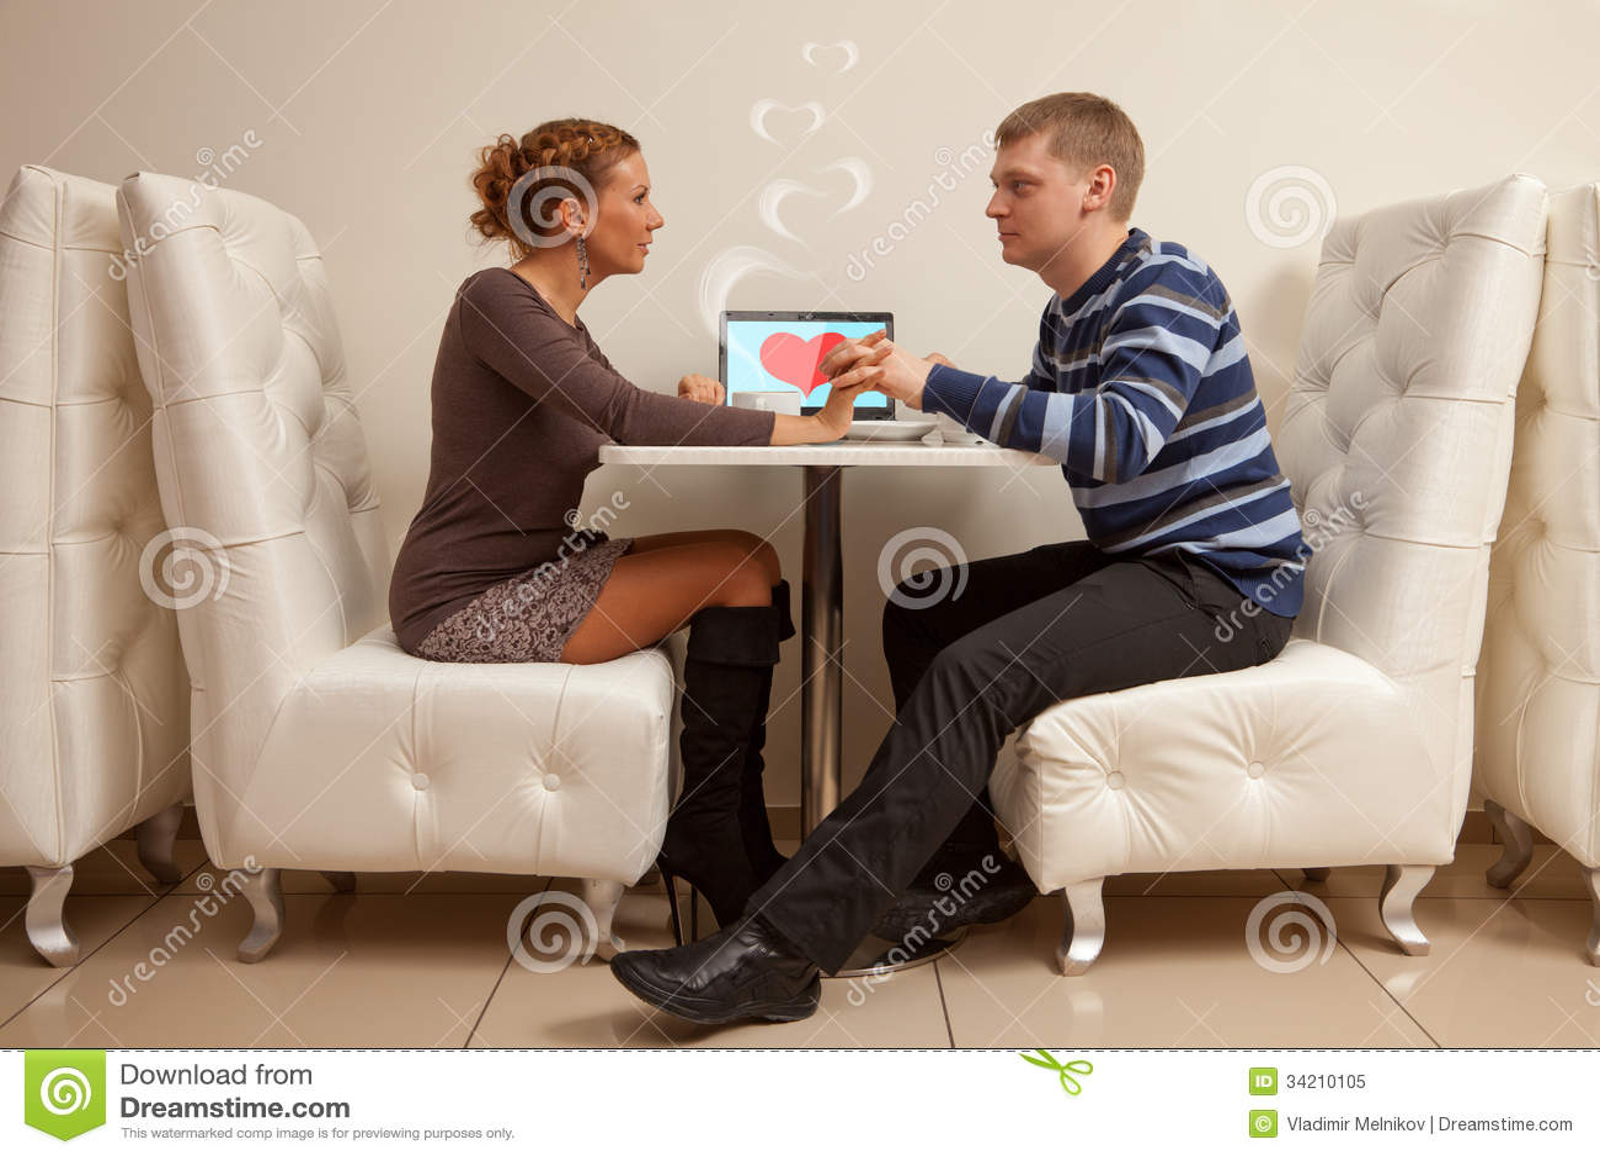 Cafe date